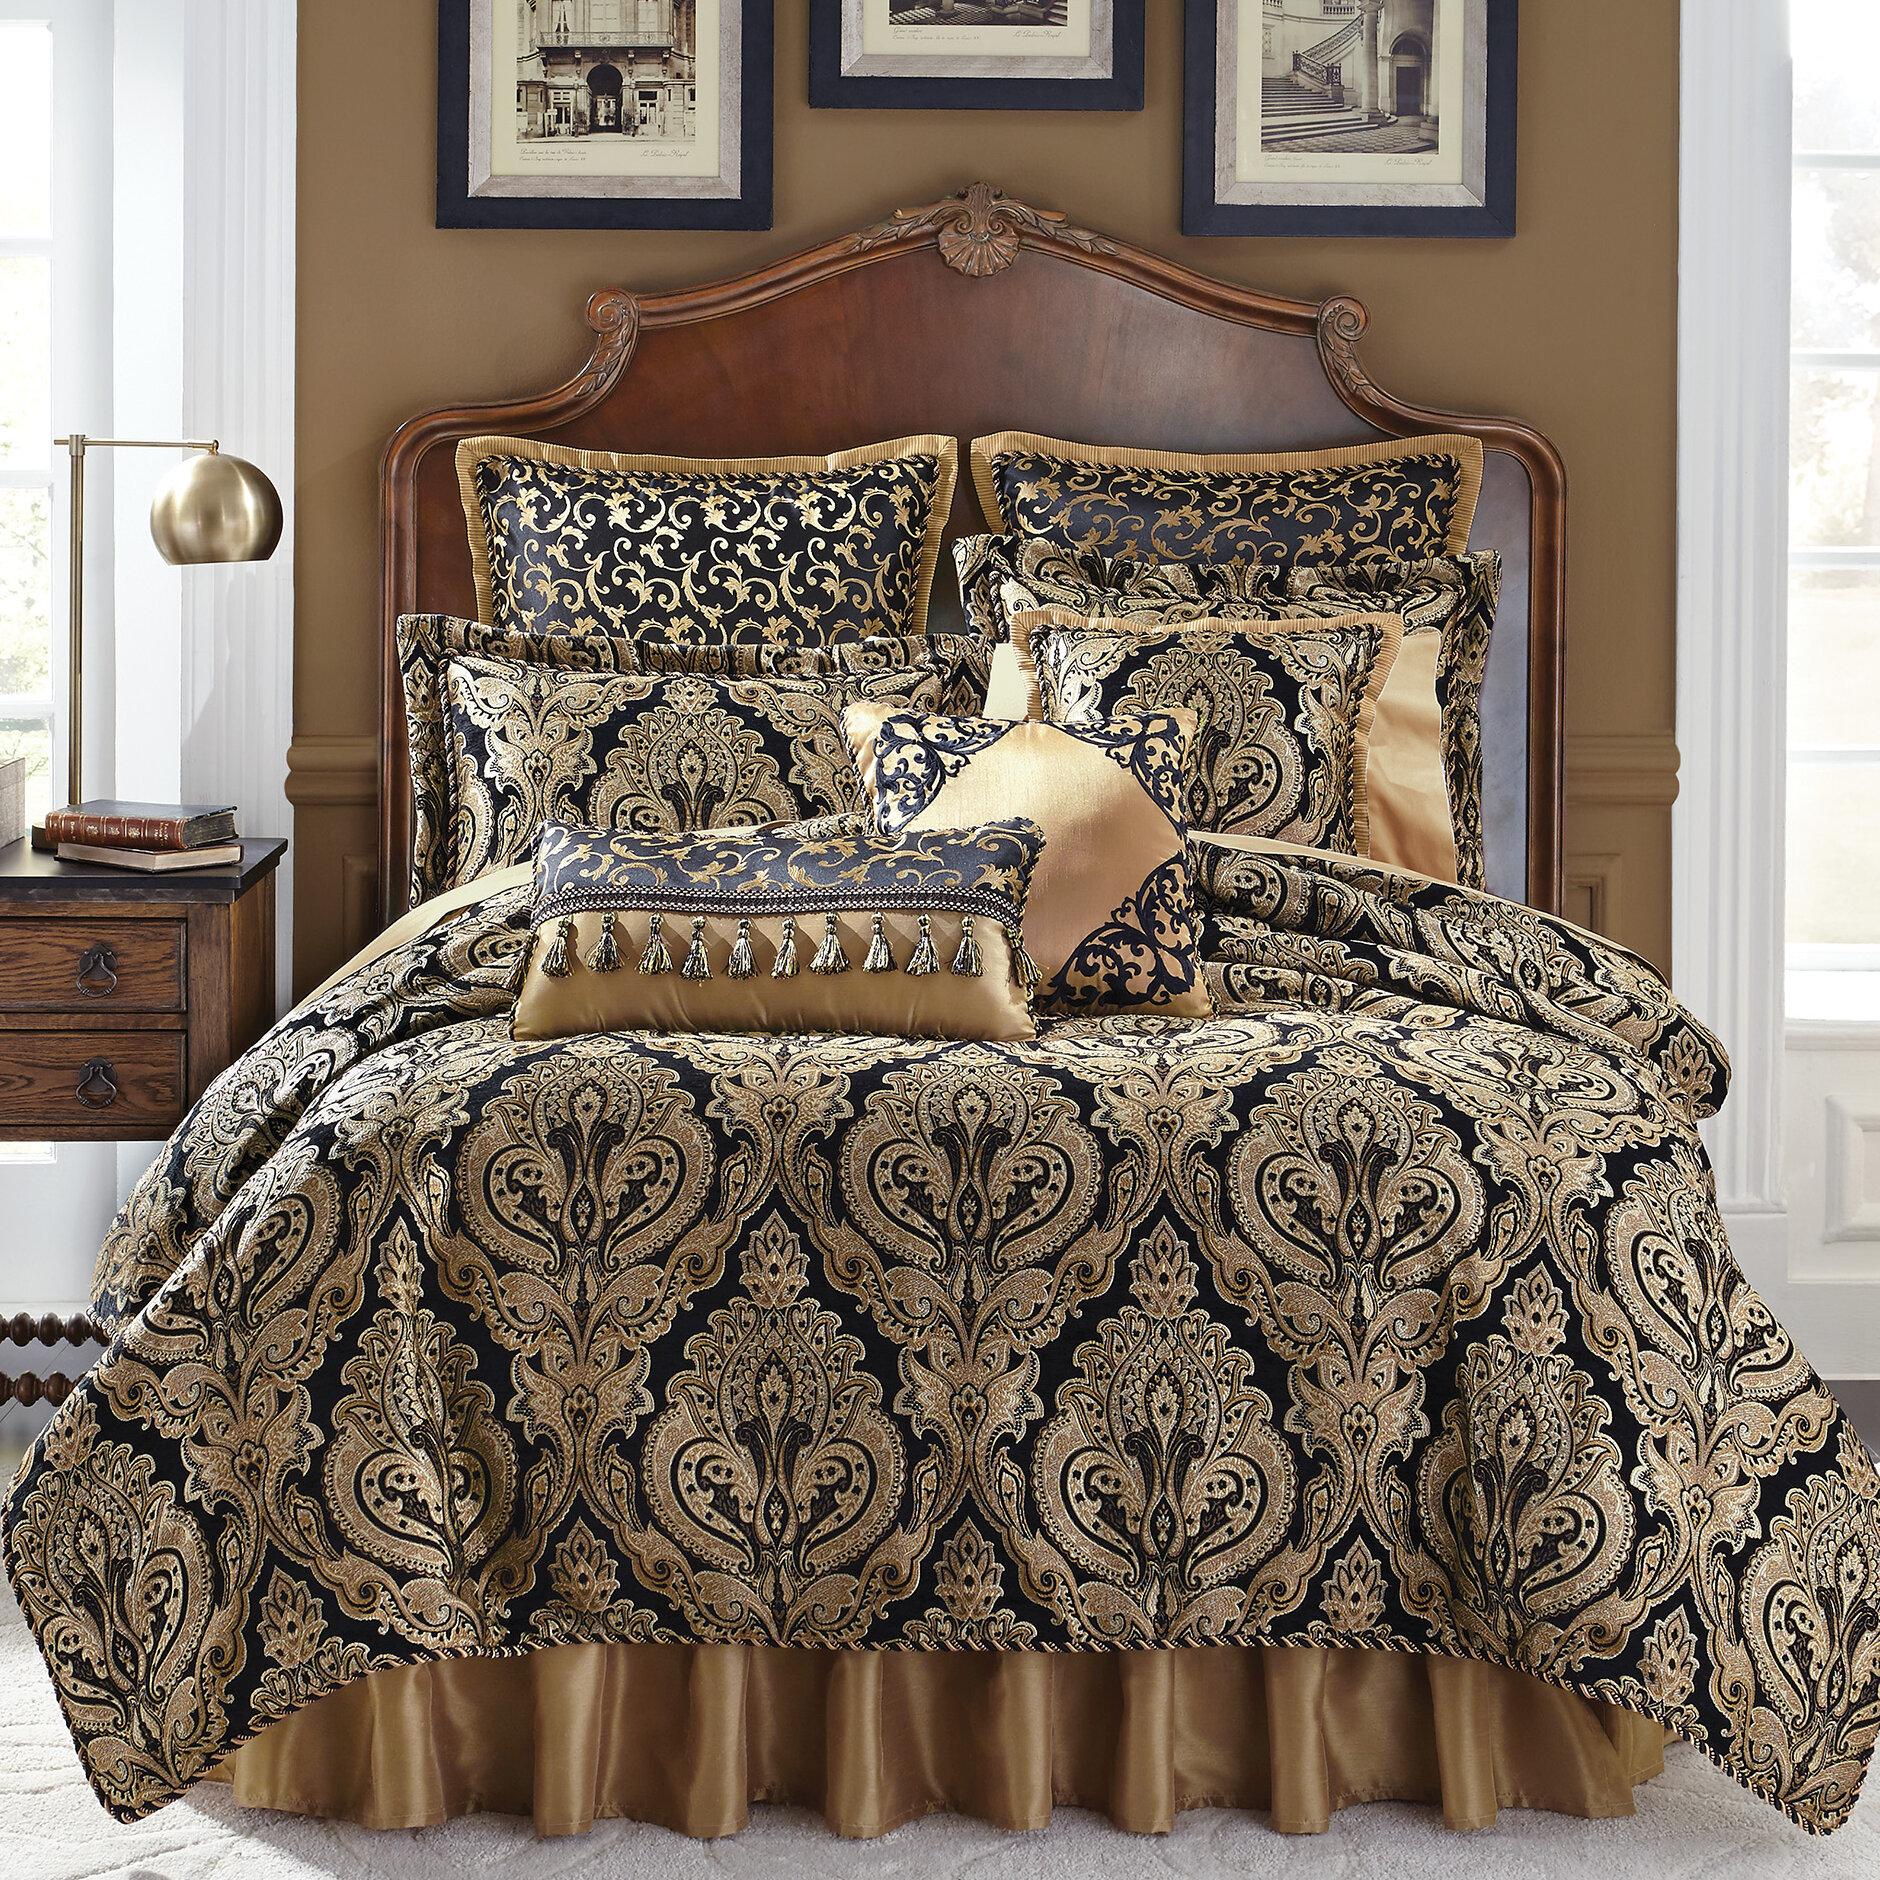 Croscill Pennington 4 Piece Reversible Comforter Set & Reviews | Wayfair